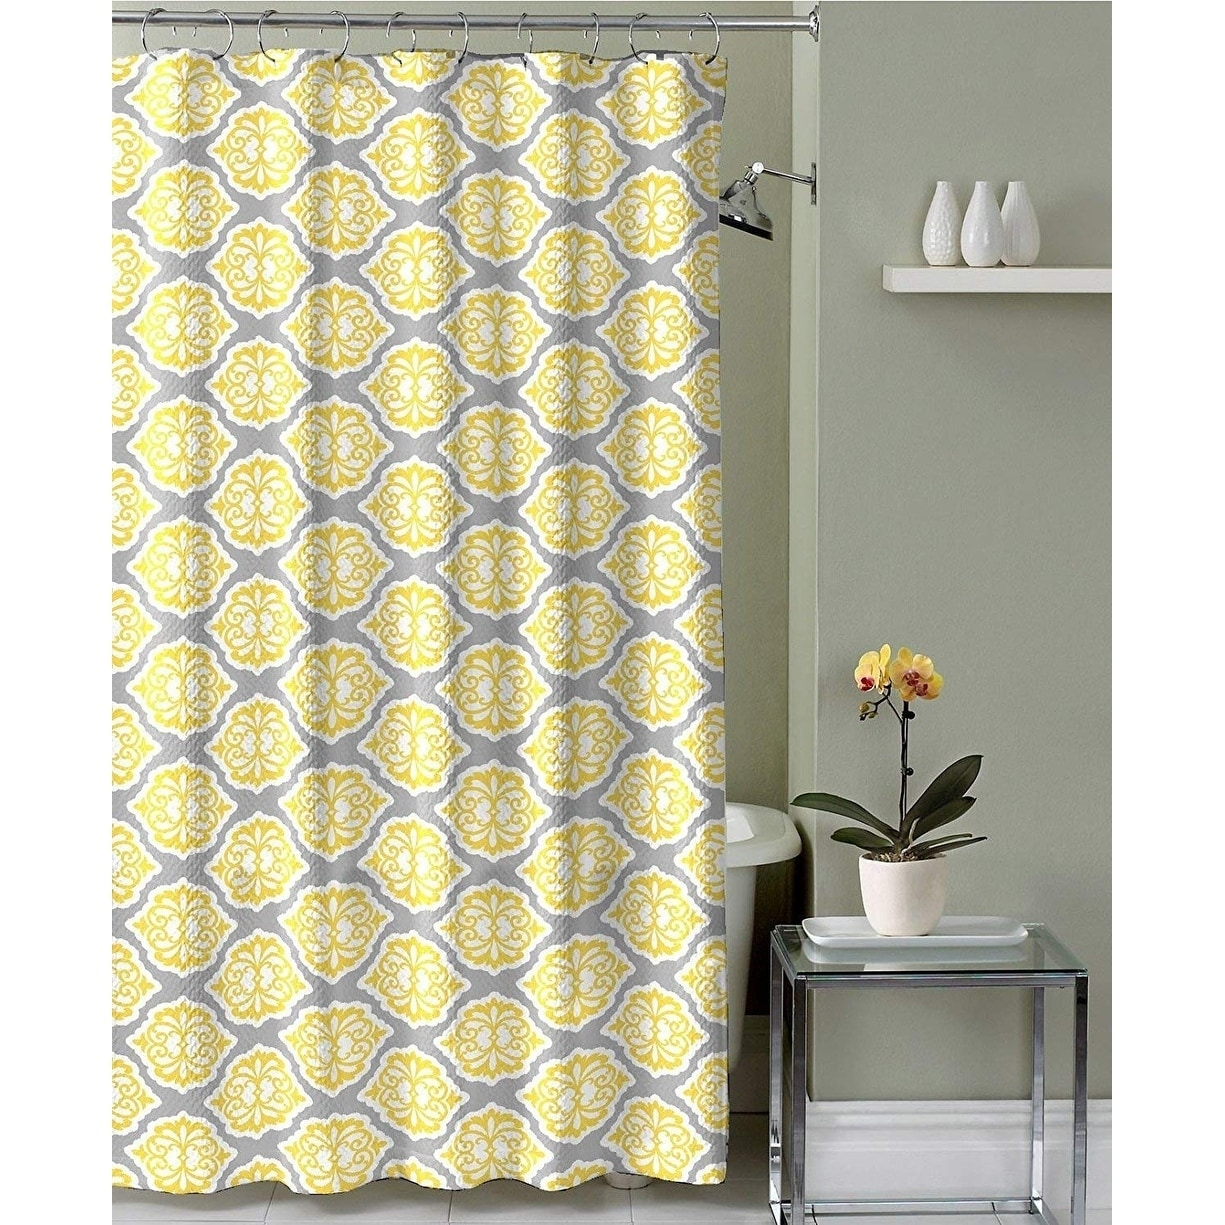 Shop Grey Lemon Yellow Fabric Shower Curtain: Modern Floral Moroccan ...